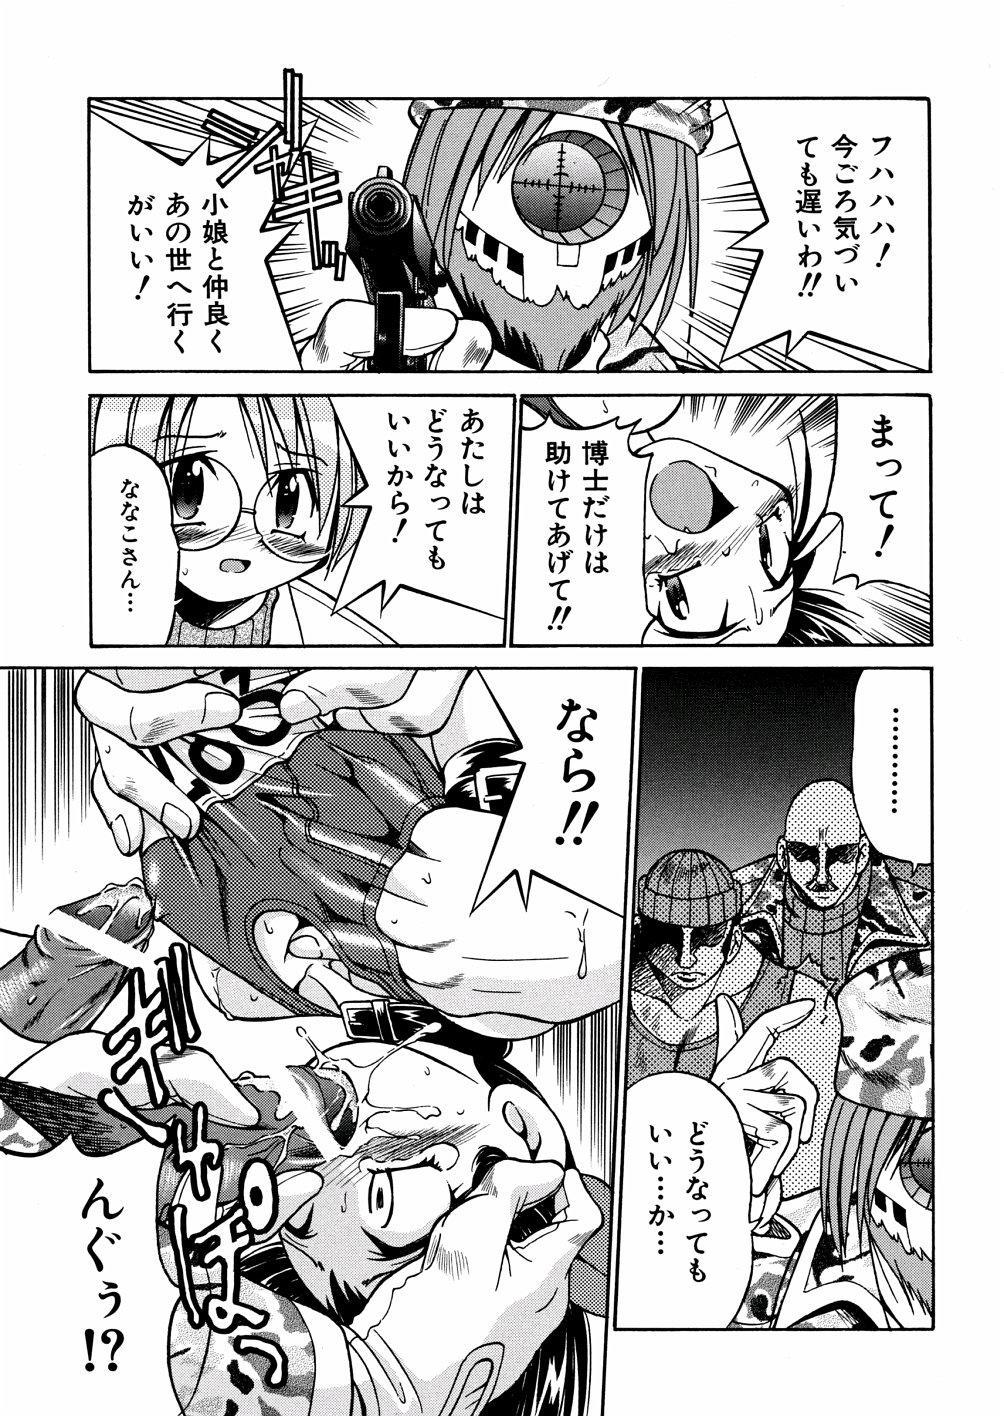 00 Nanako - Agent Nanako 23